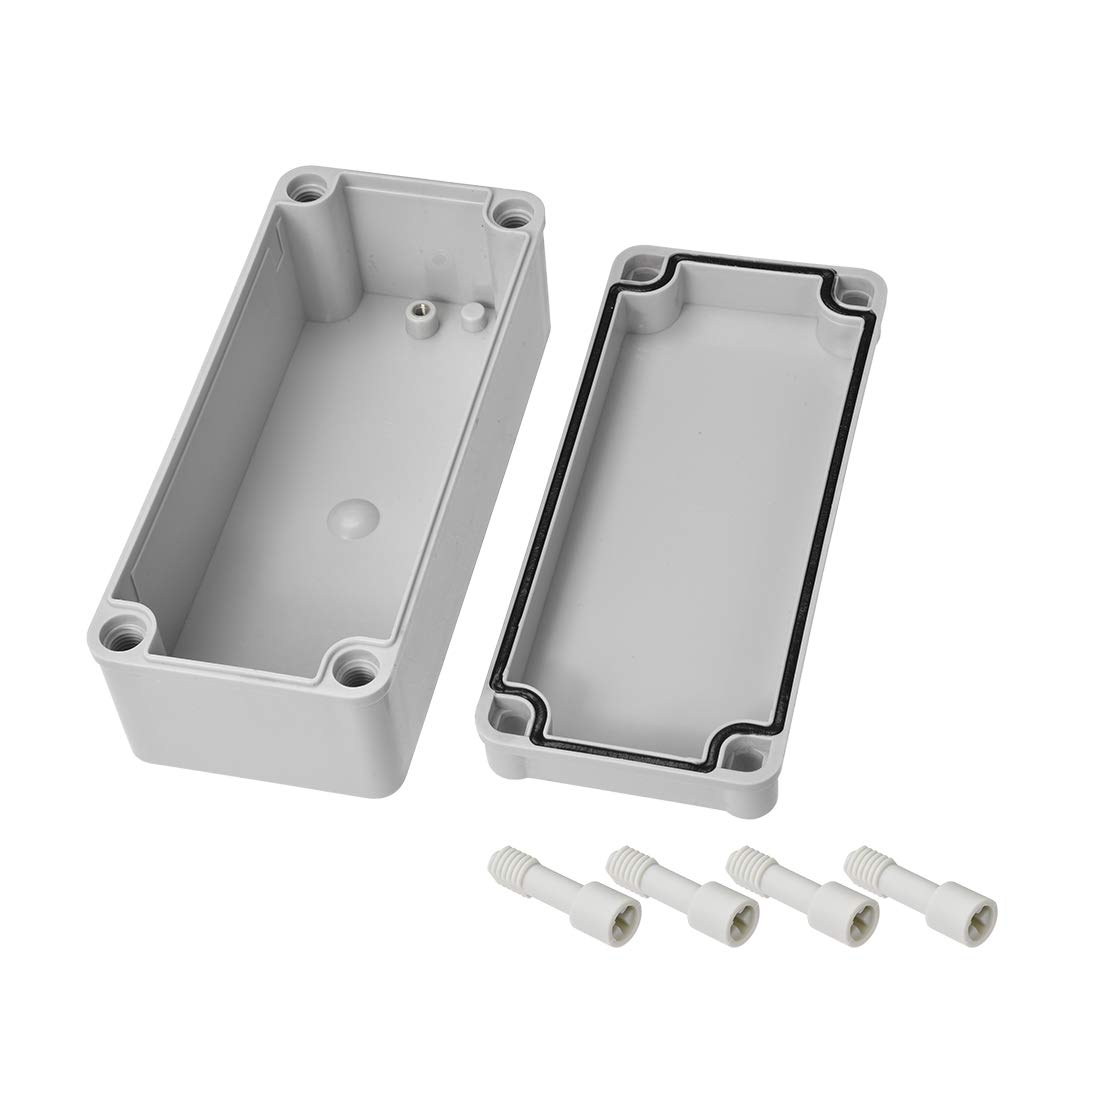 sourcing map 160mm x 80mm x 55mm staubdicht IP65 Junktion Box DIY Deckel eingeschlossen DE de